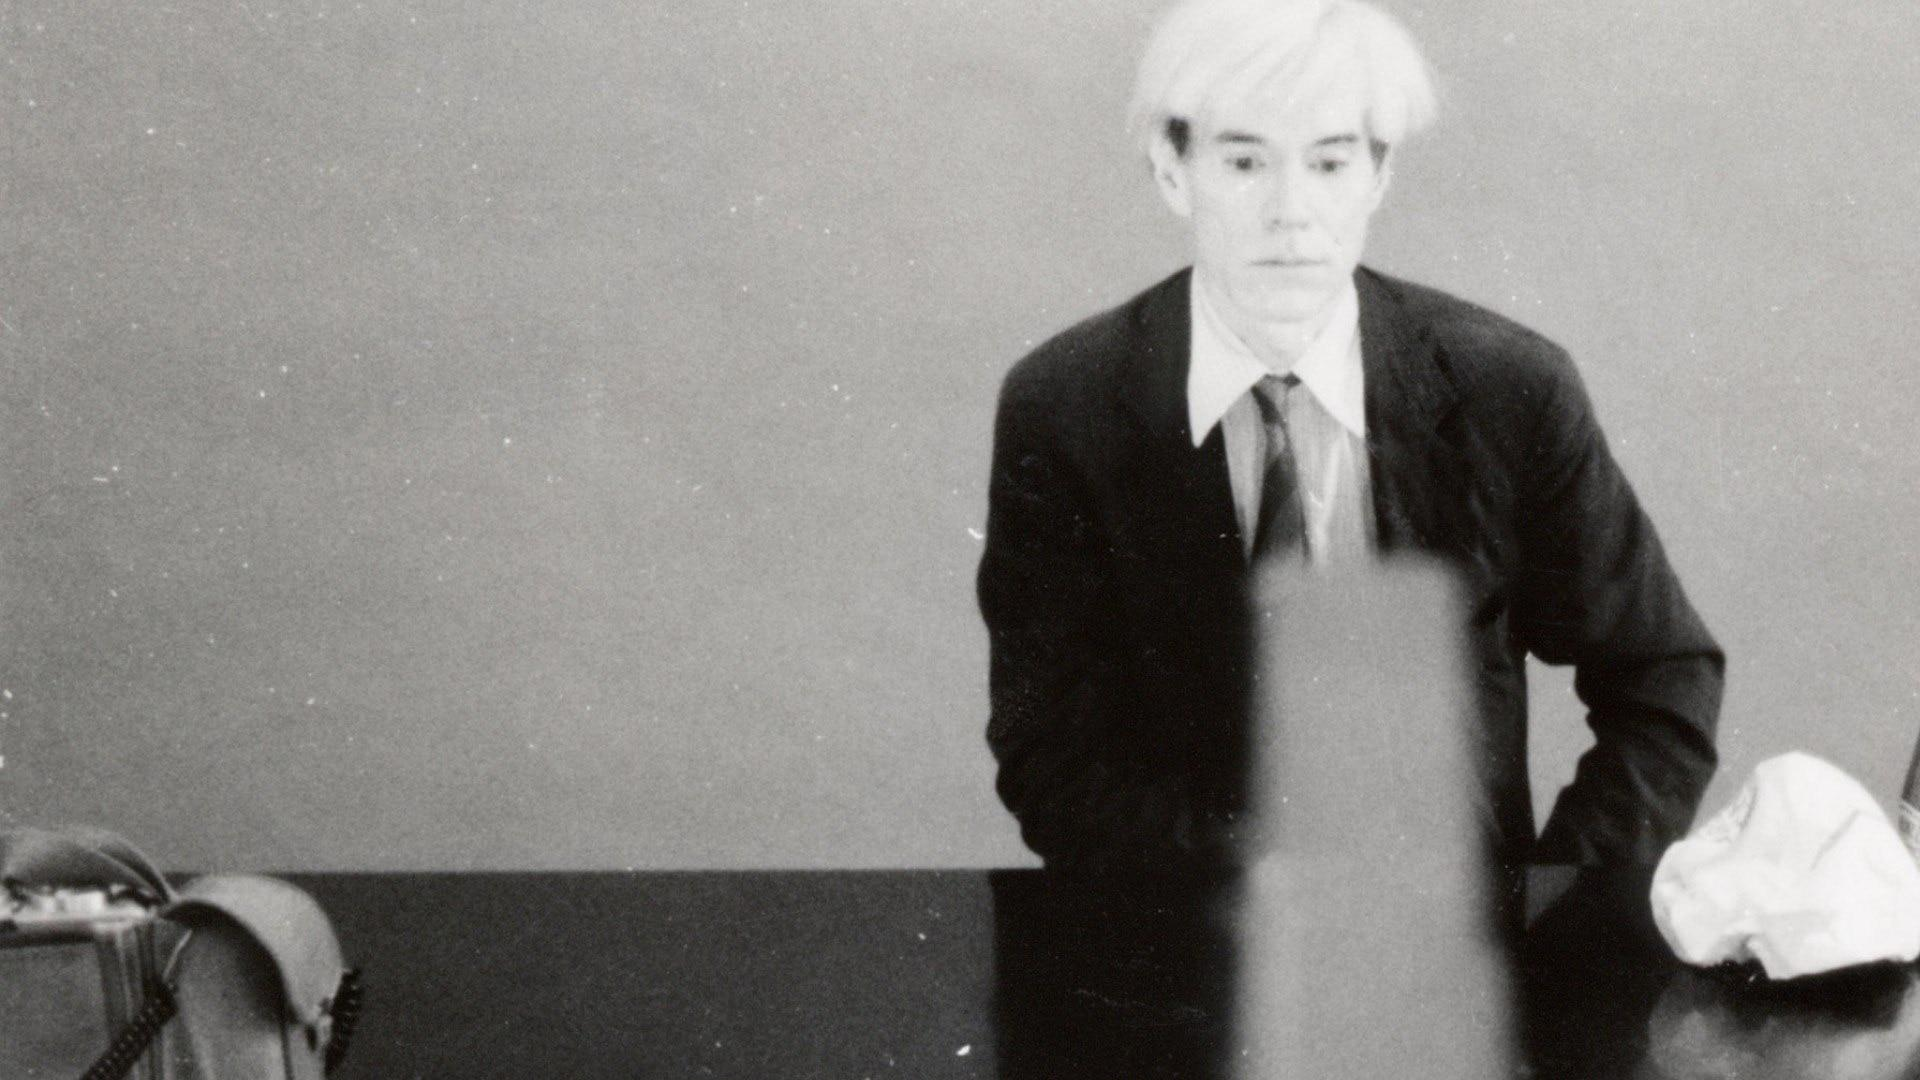 Sky Arte HD Andy Warhol - Un ritratto - 1^TV